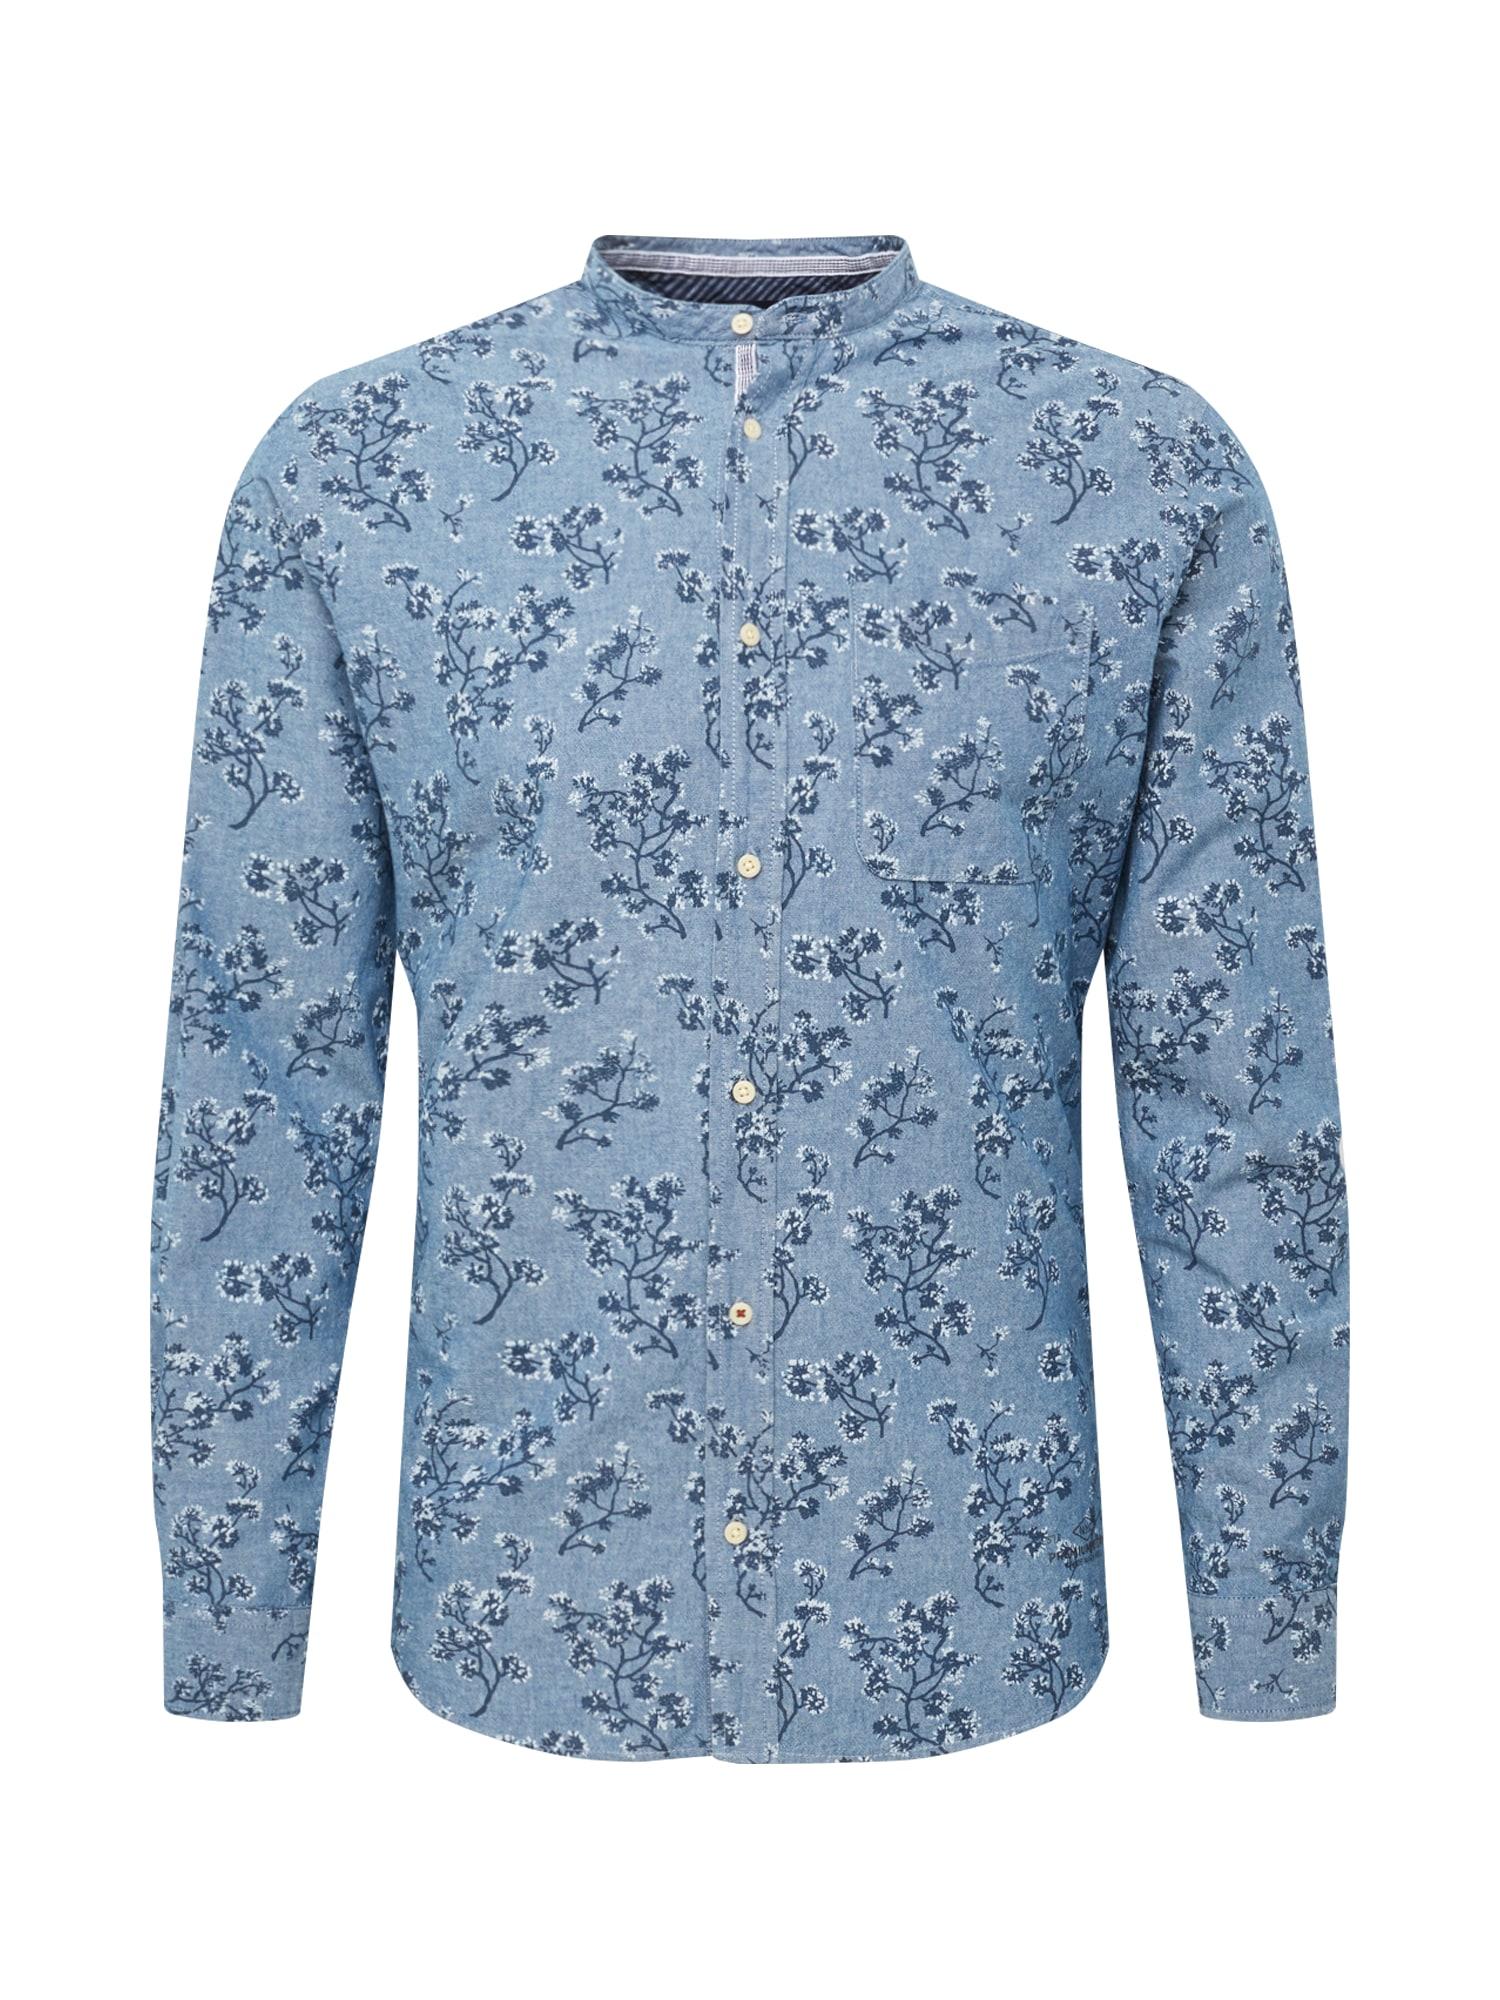 Košile JPRDEREK BAND SHIRT LS ONE POCKET modrá tmavě modrá JACK & JONES